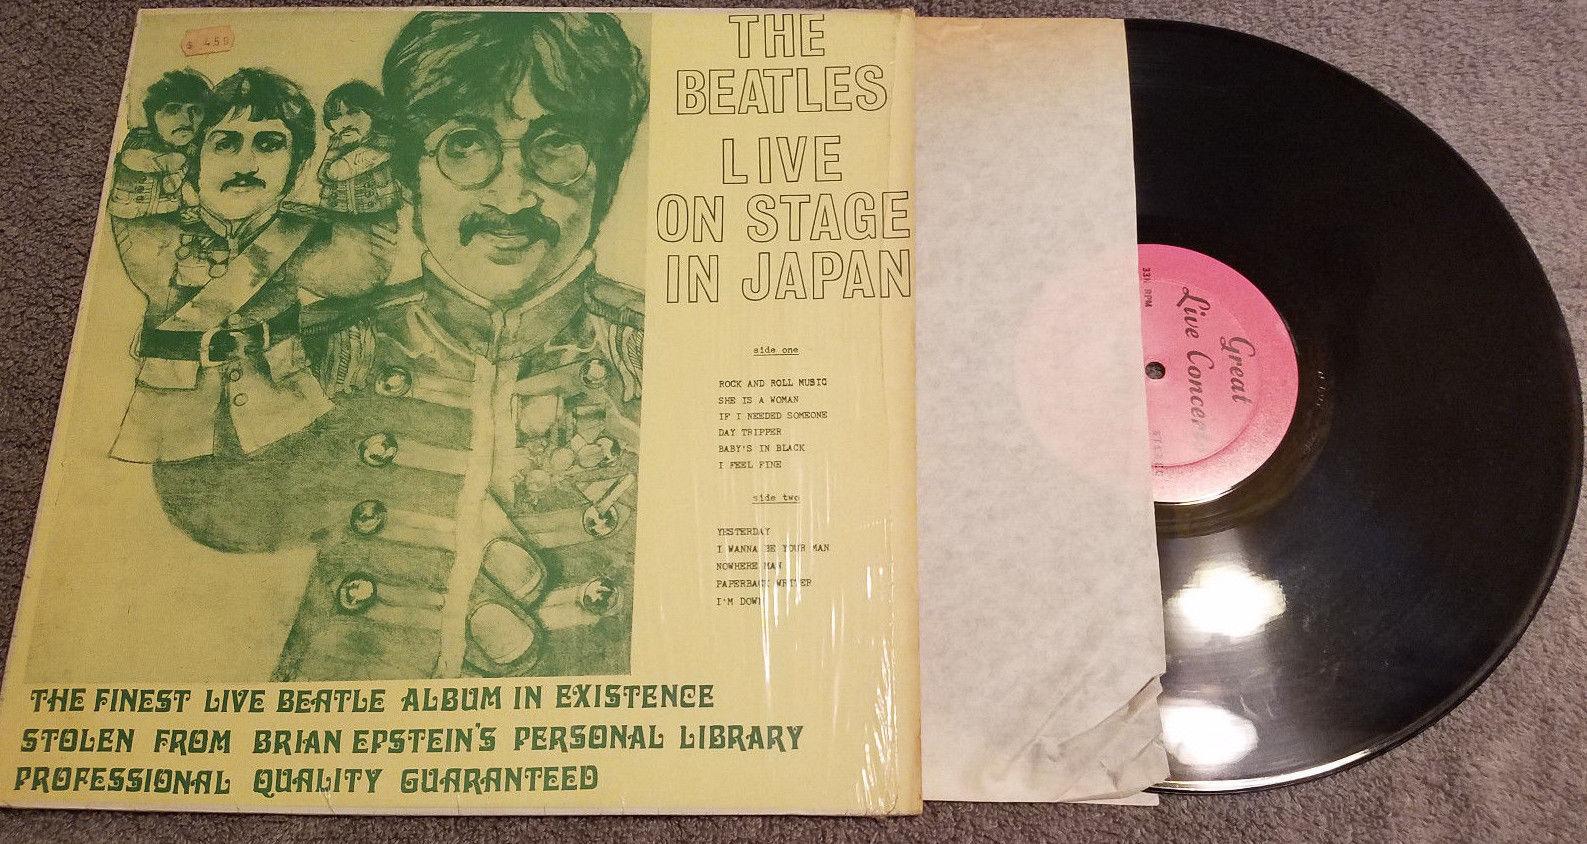 BEATLES LIVE ON STAGE IN JAPAN 1966 LP GLC209 (1970s PRESS W SHRINK - NM- WAX)